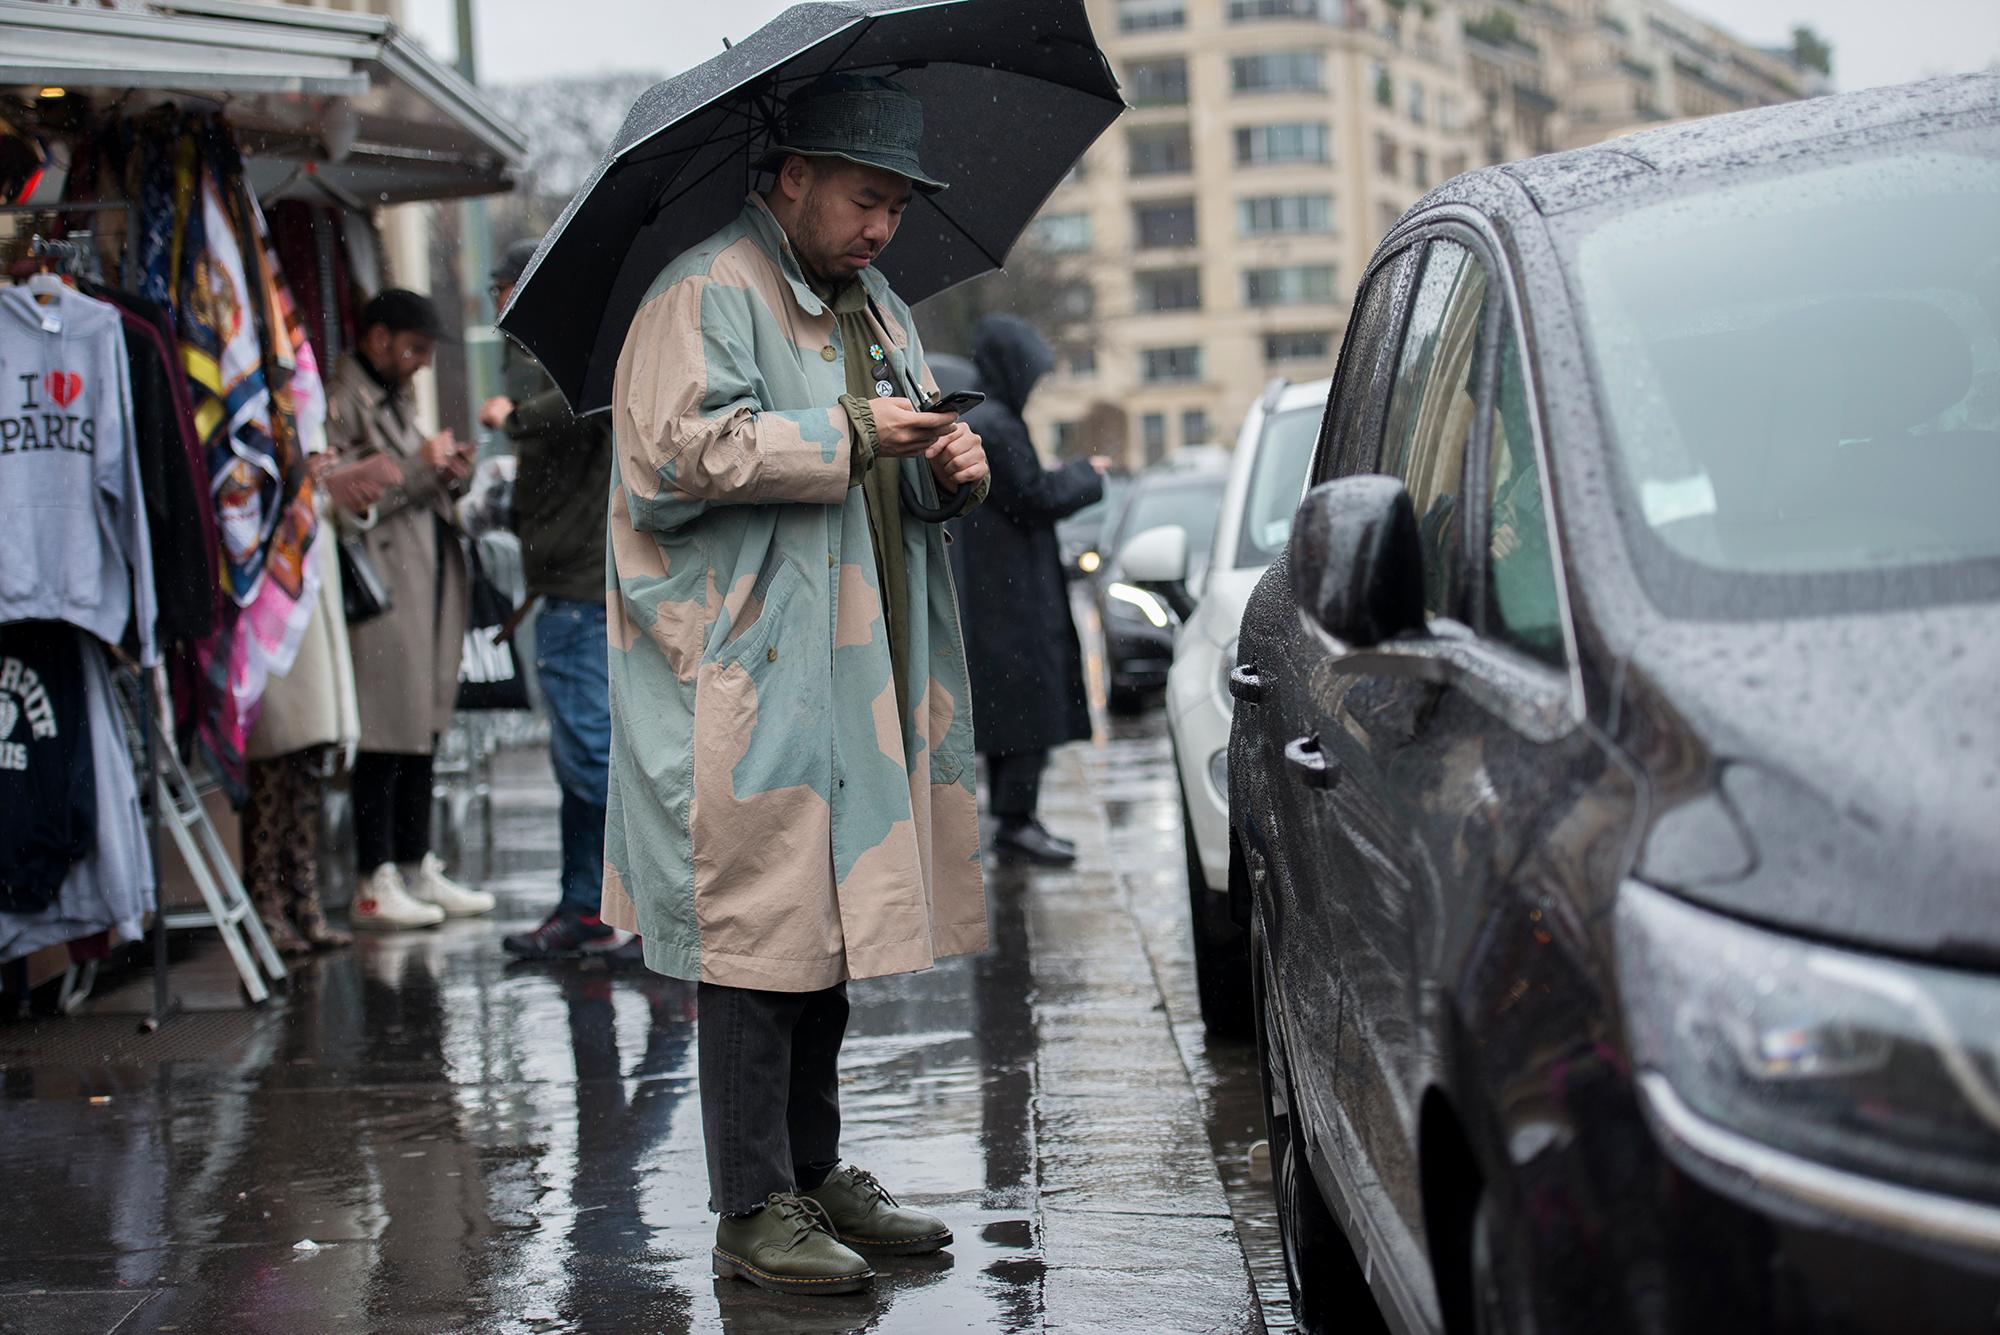 Streetsnaps Paris Fashion Week March 2017 Part 2 - 3747933